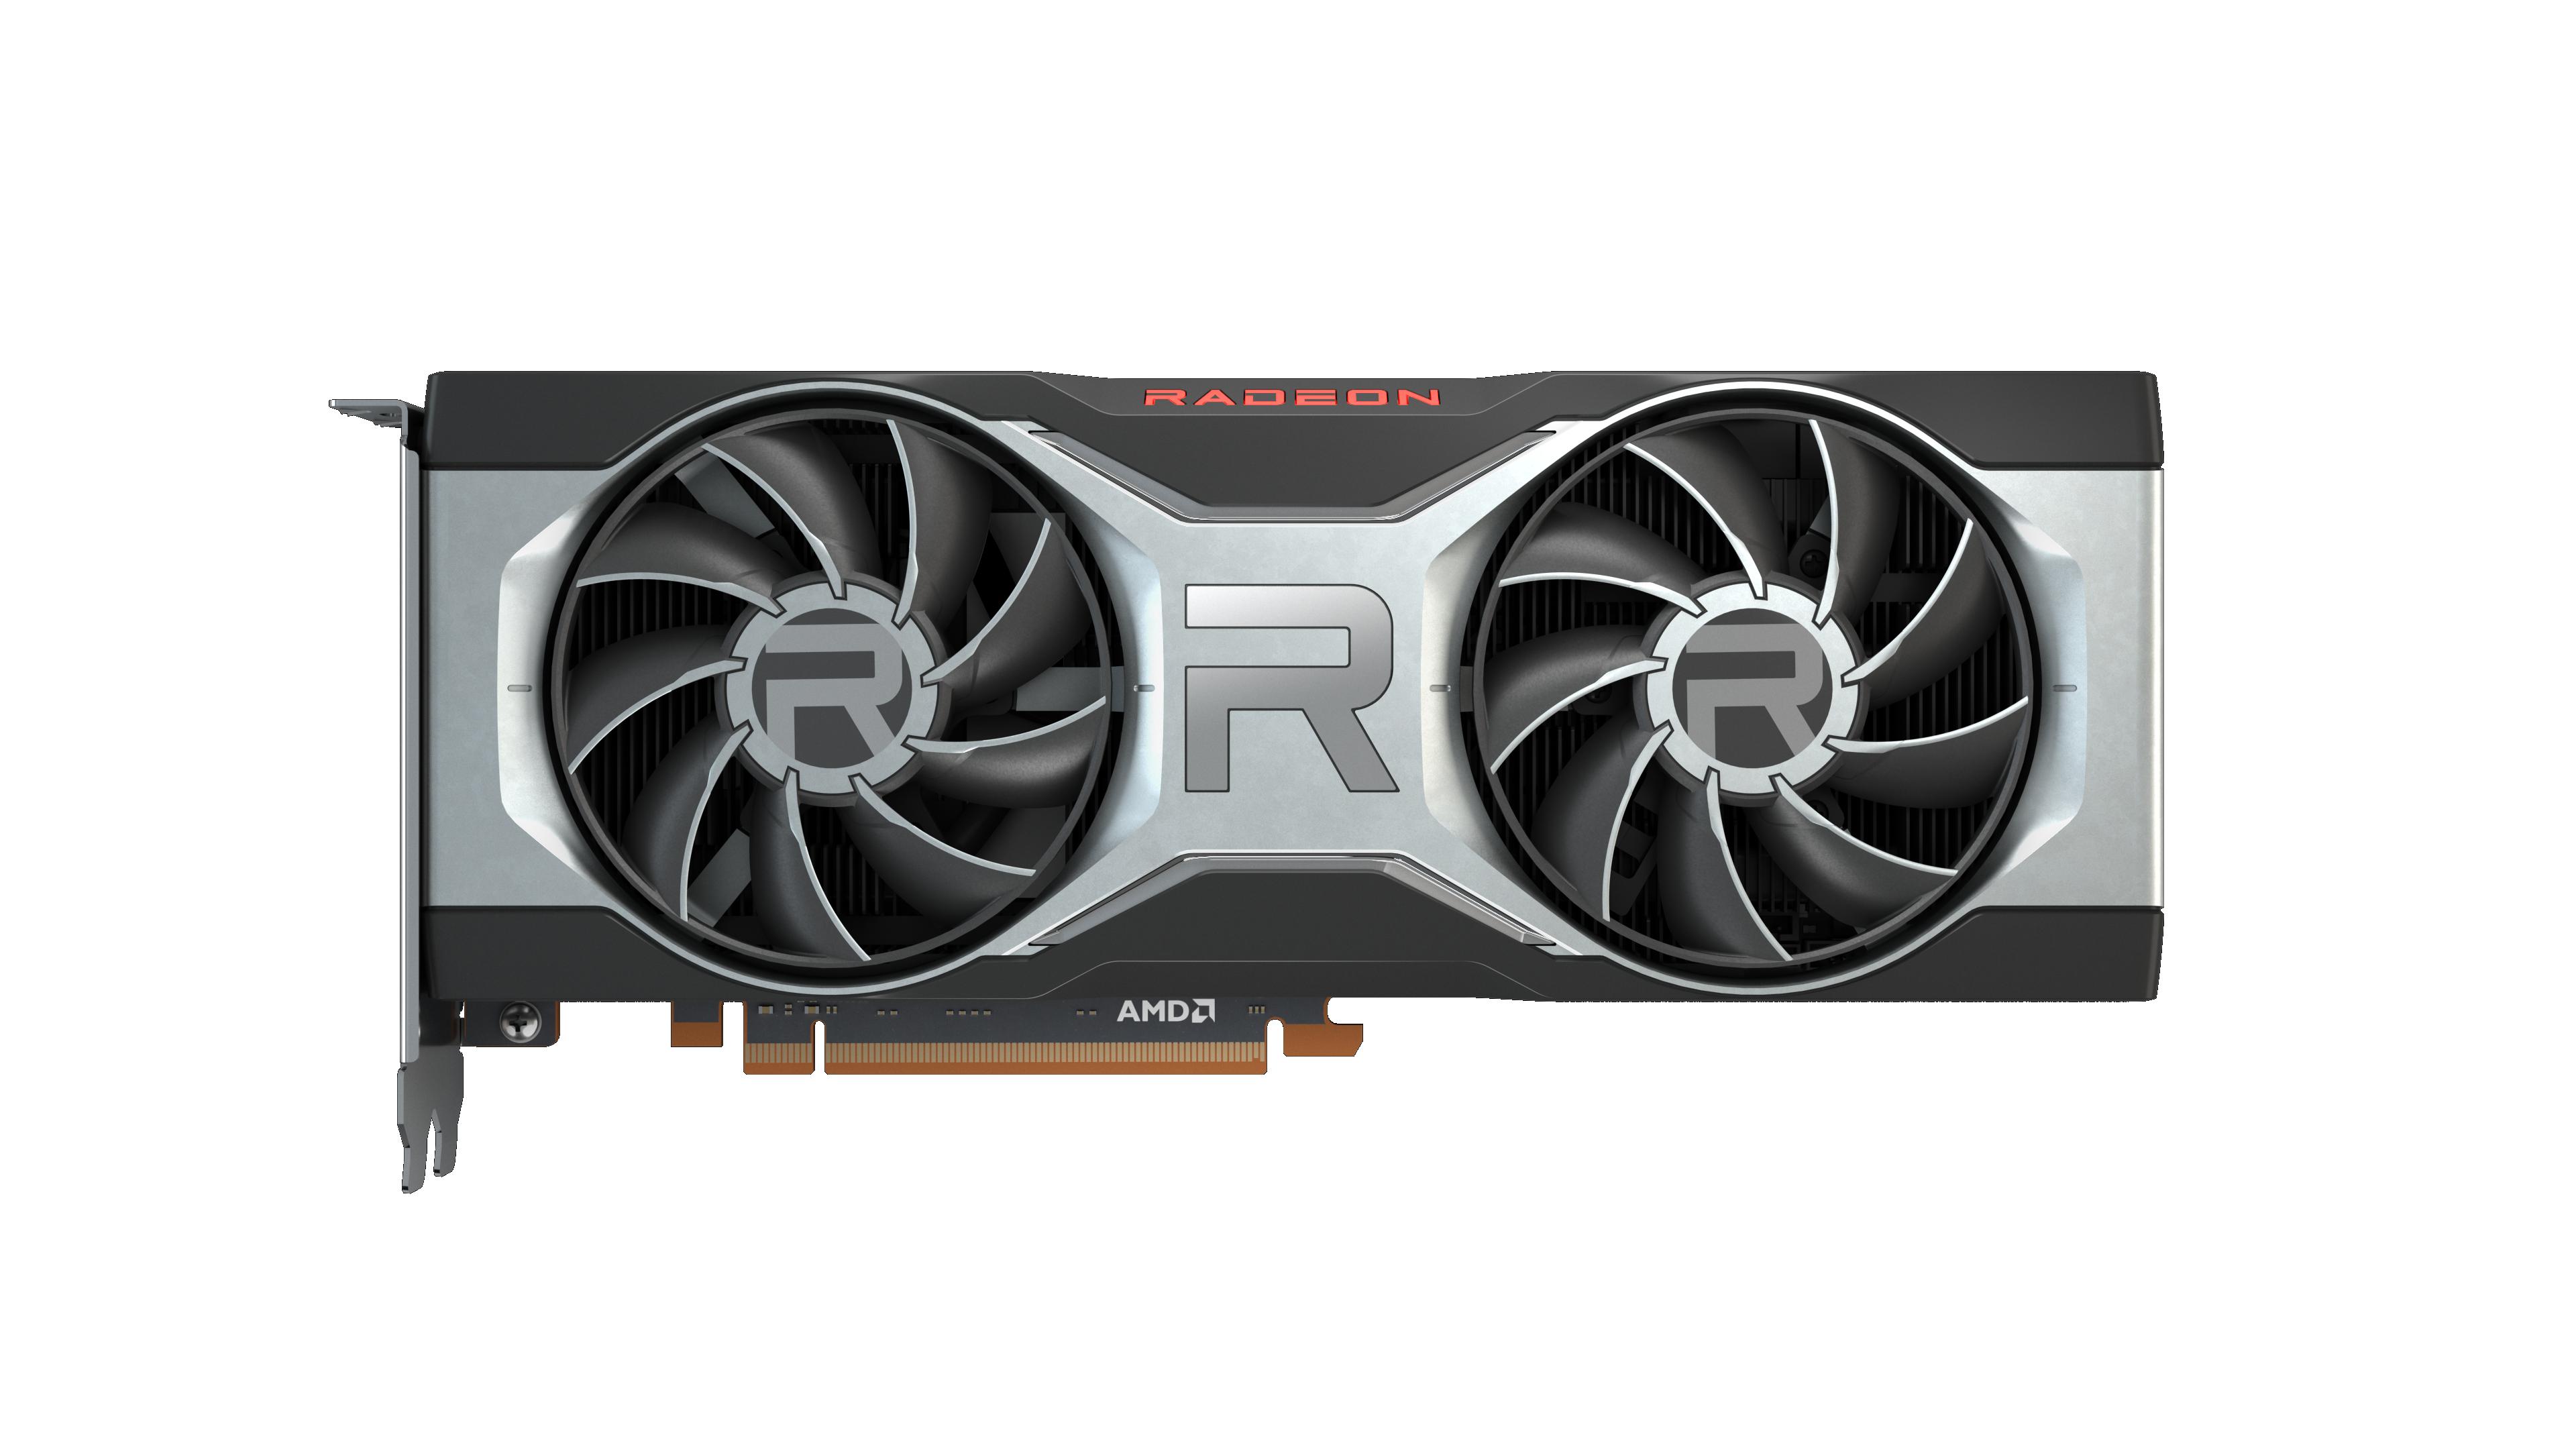 AMD Radeon RX 6700 XT 顯示卡 1440p 效能定價 479 美元起